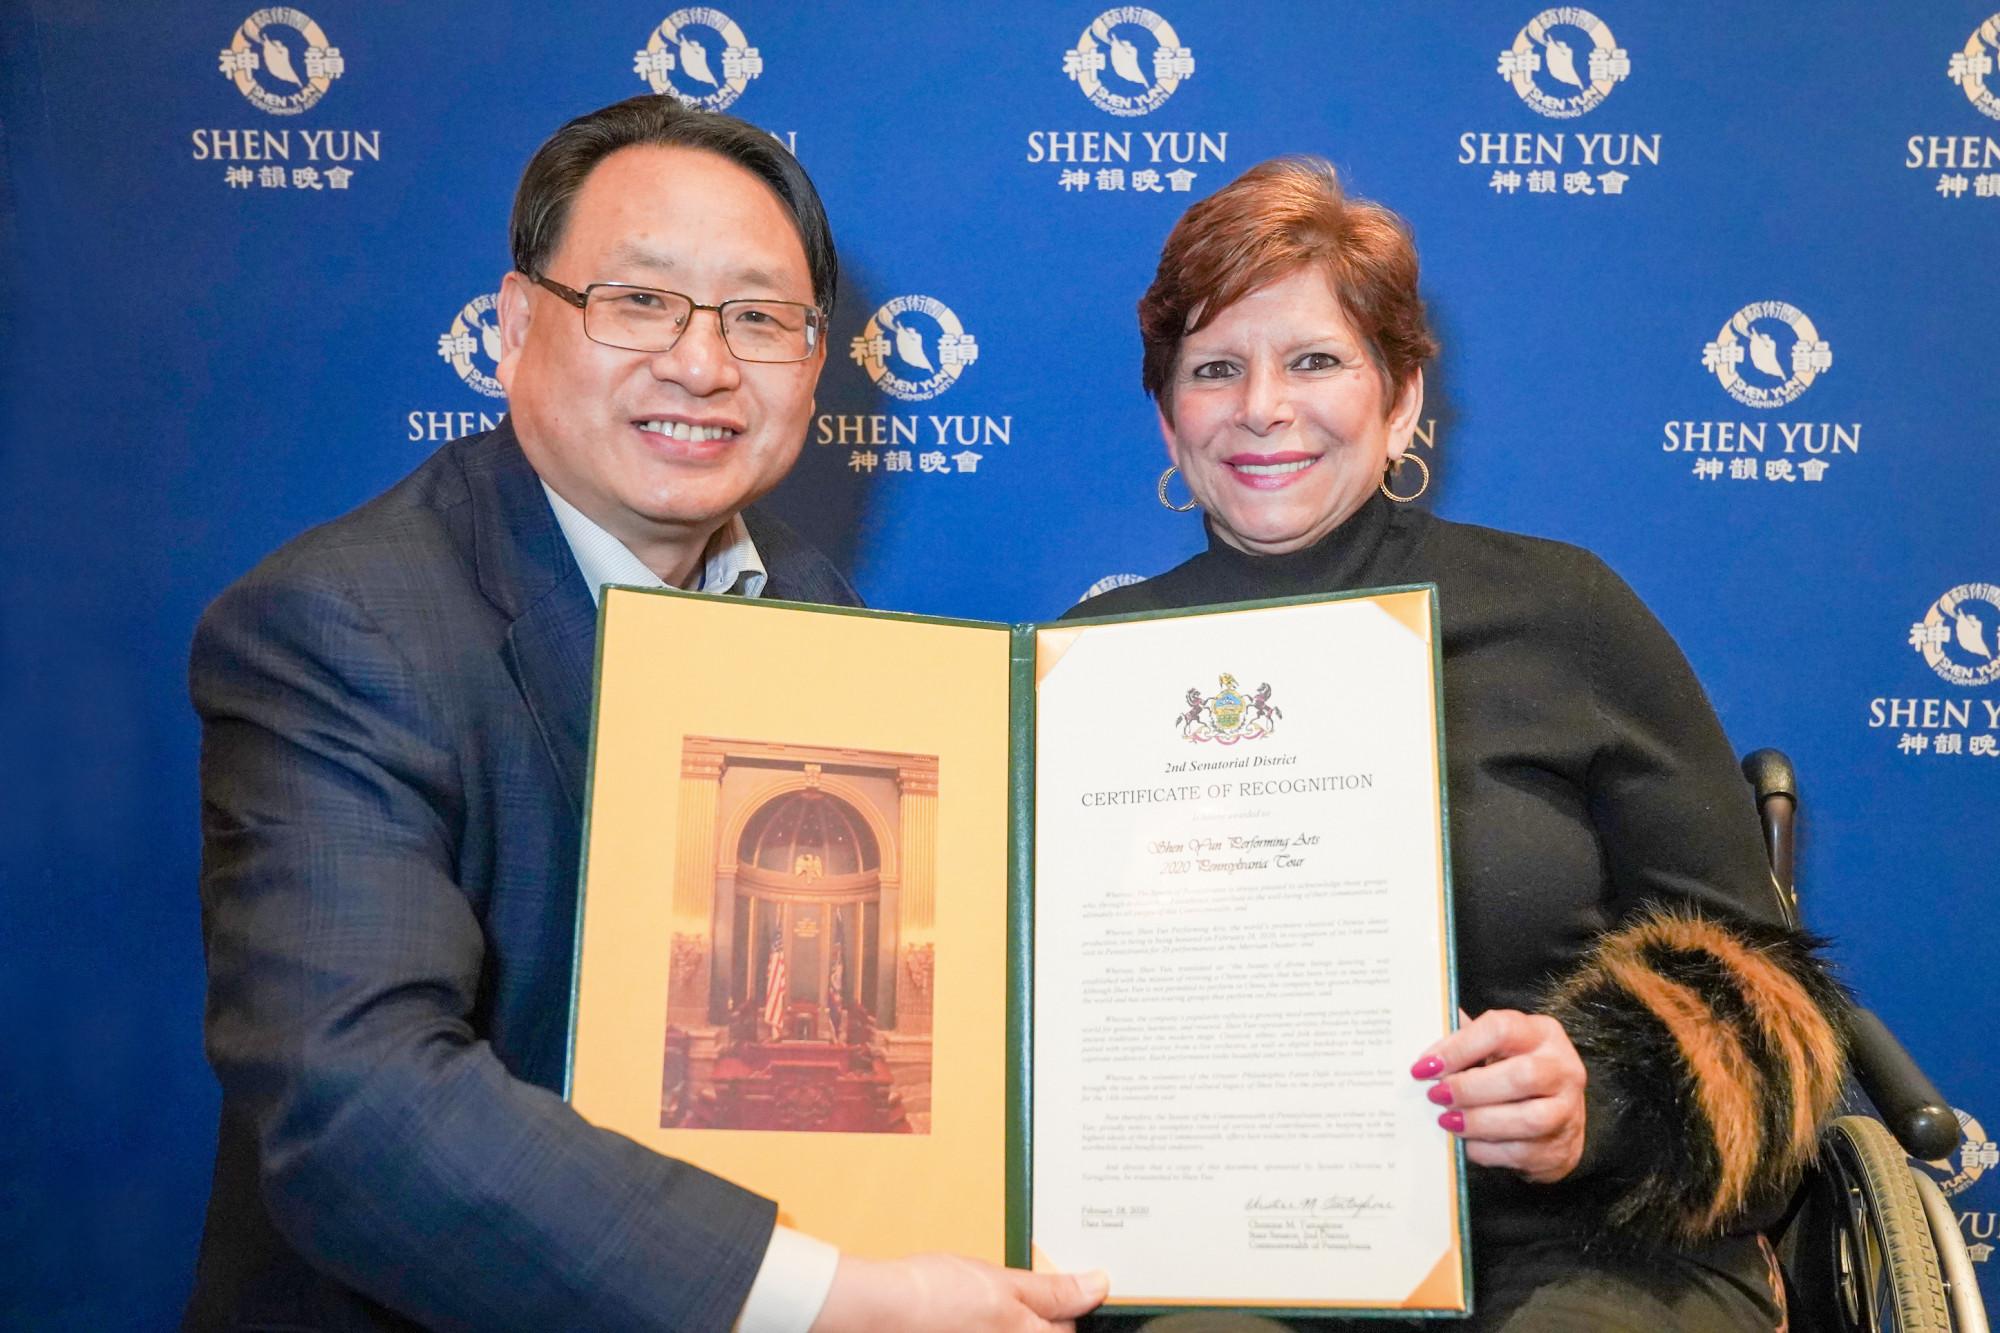 Pennsylvania State Senator: Shen Yun Gave Me Hope